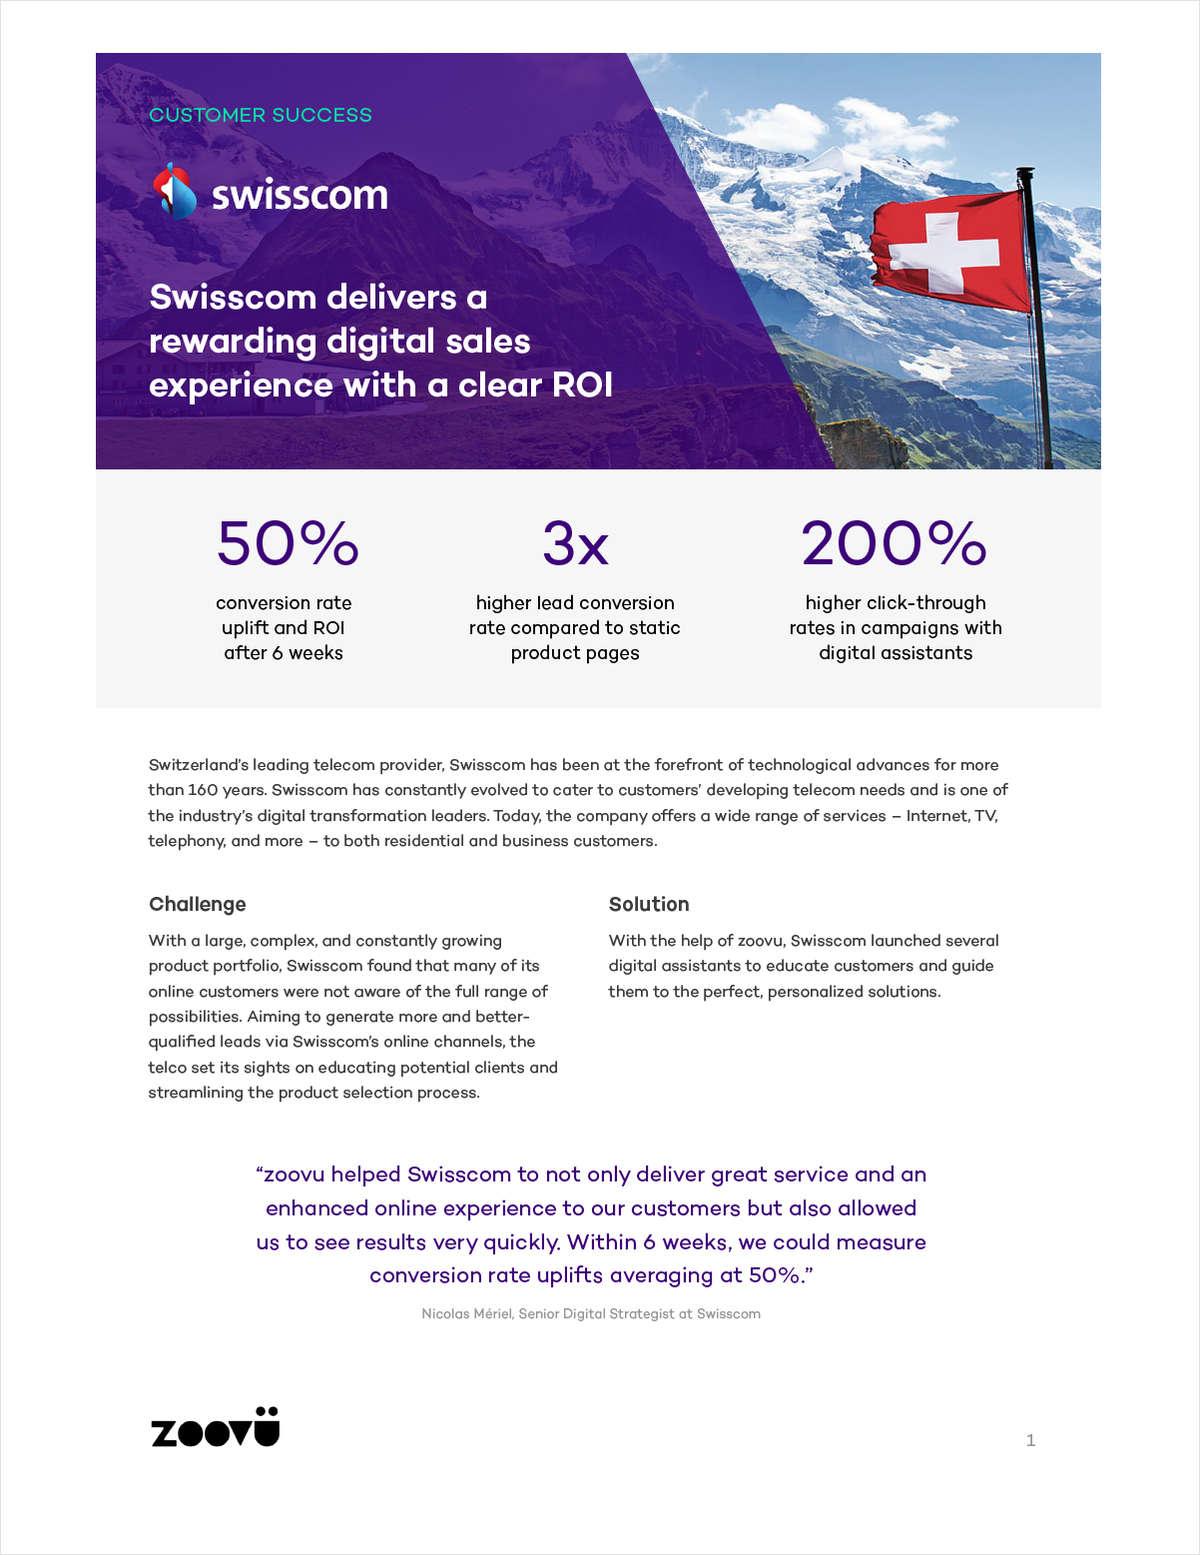 Swisscom Drives Lead Generation with Intelligent Digital Assistants